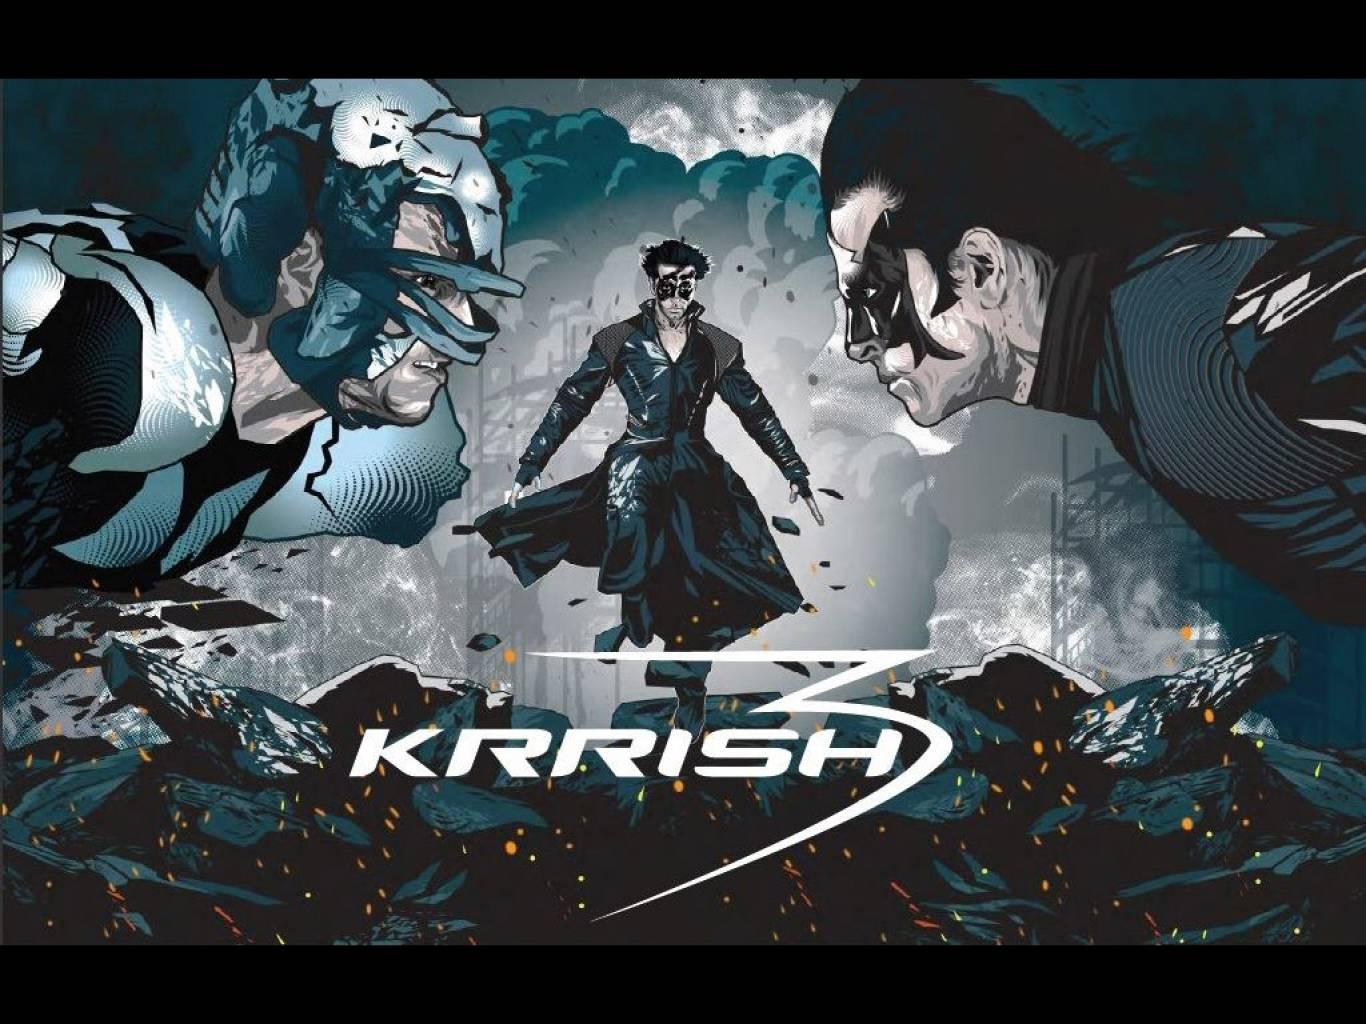 Krrish 3 Movie Hd Wallpapers Krrish 3 Hd Movie Wallpapers